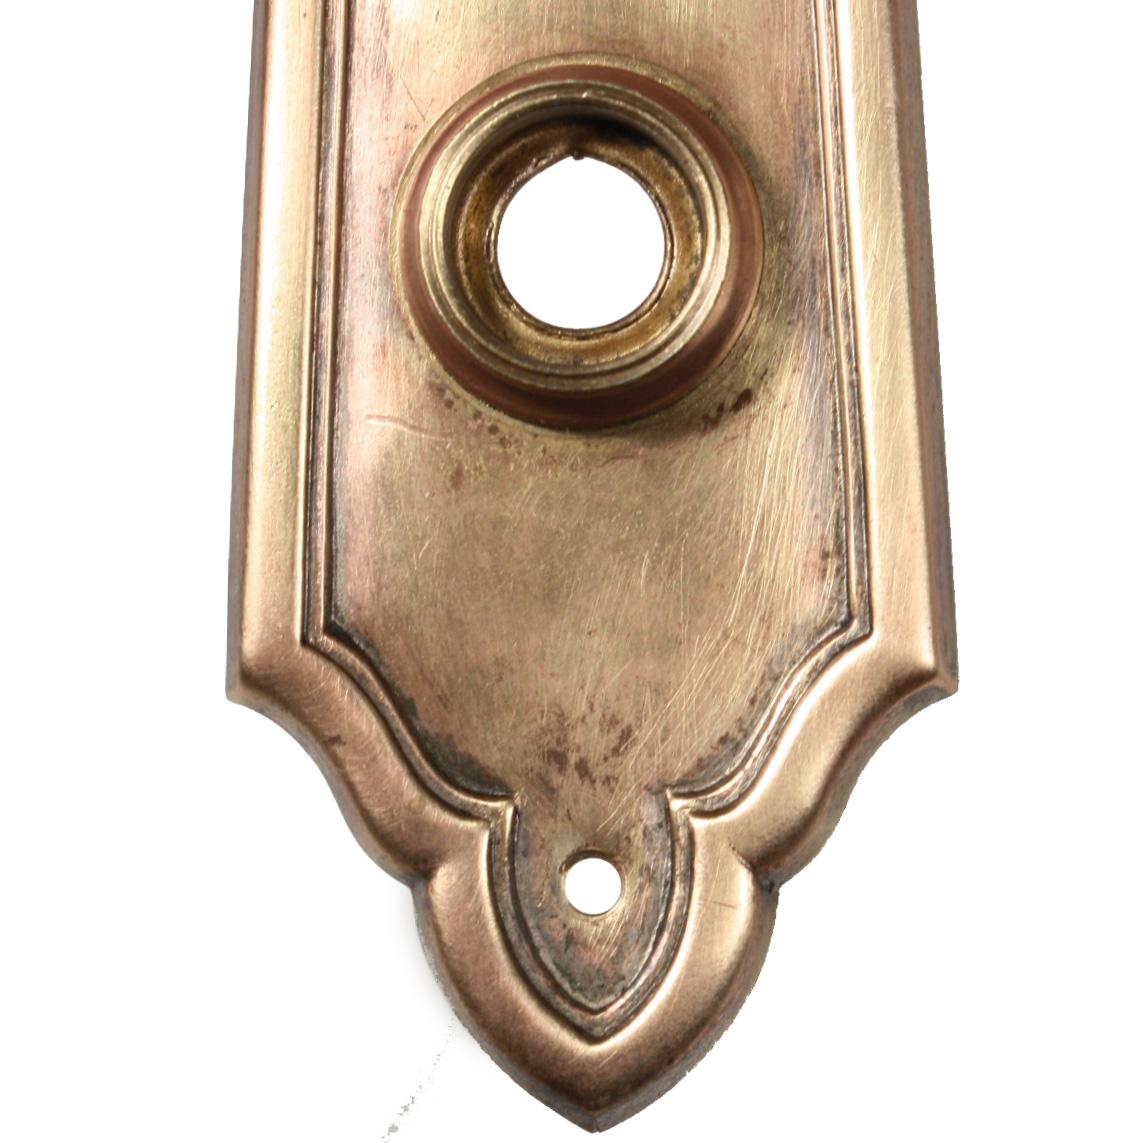 Elegant Antique Brass Exterior Door Hardware Set Design By Yale C 1905 Ndks209 Rw For Sale